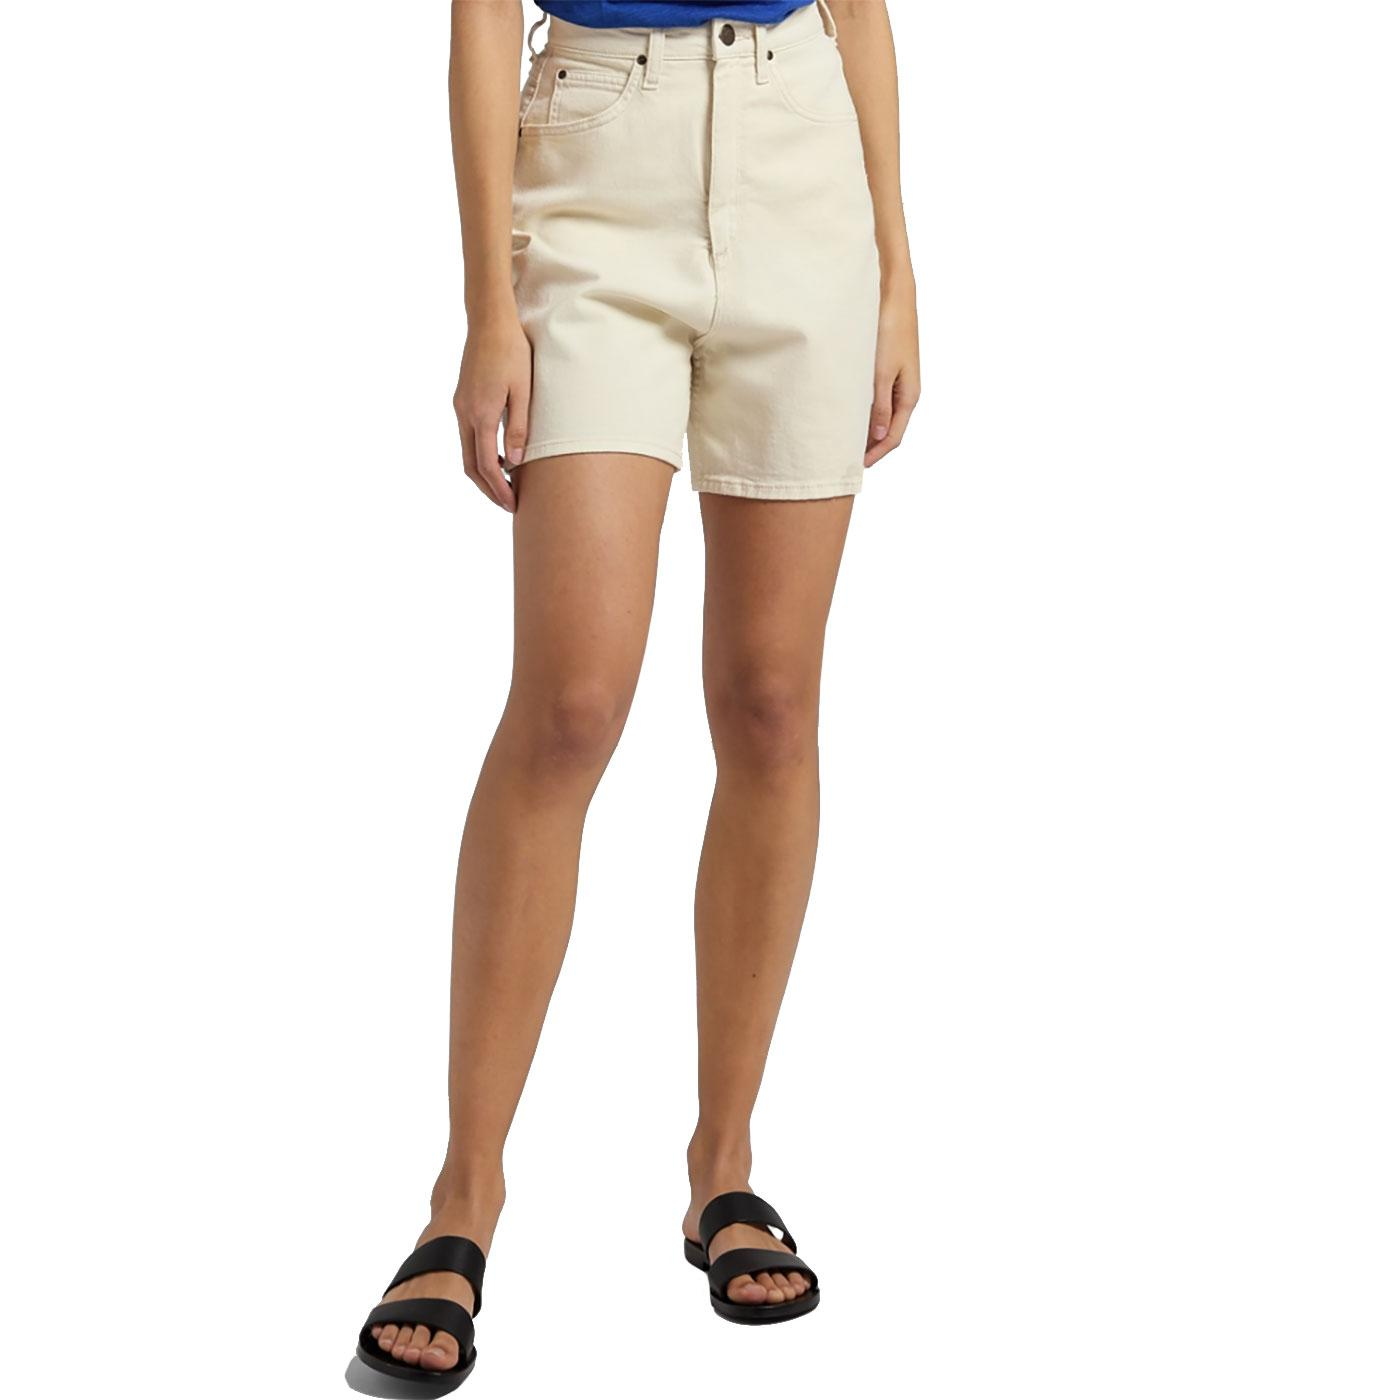 Stella LEE JEANS Womens High Wasit Shorts - Ecru